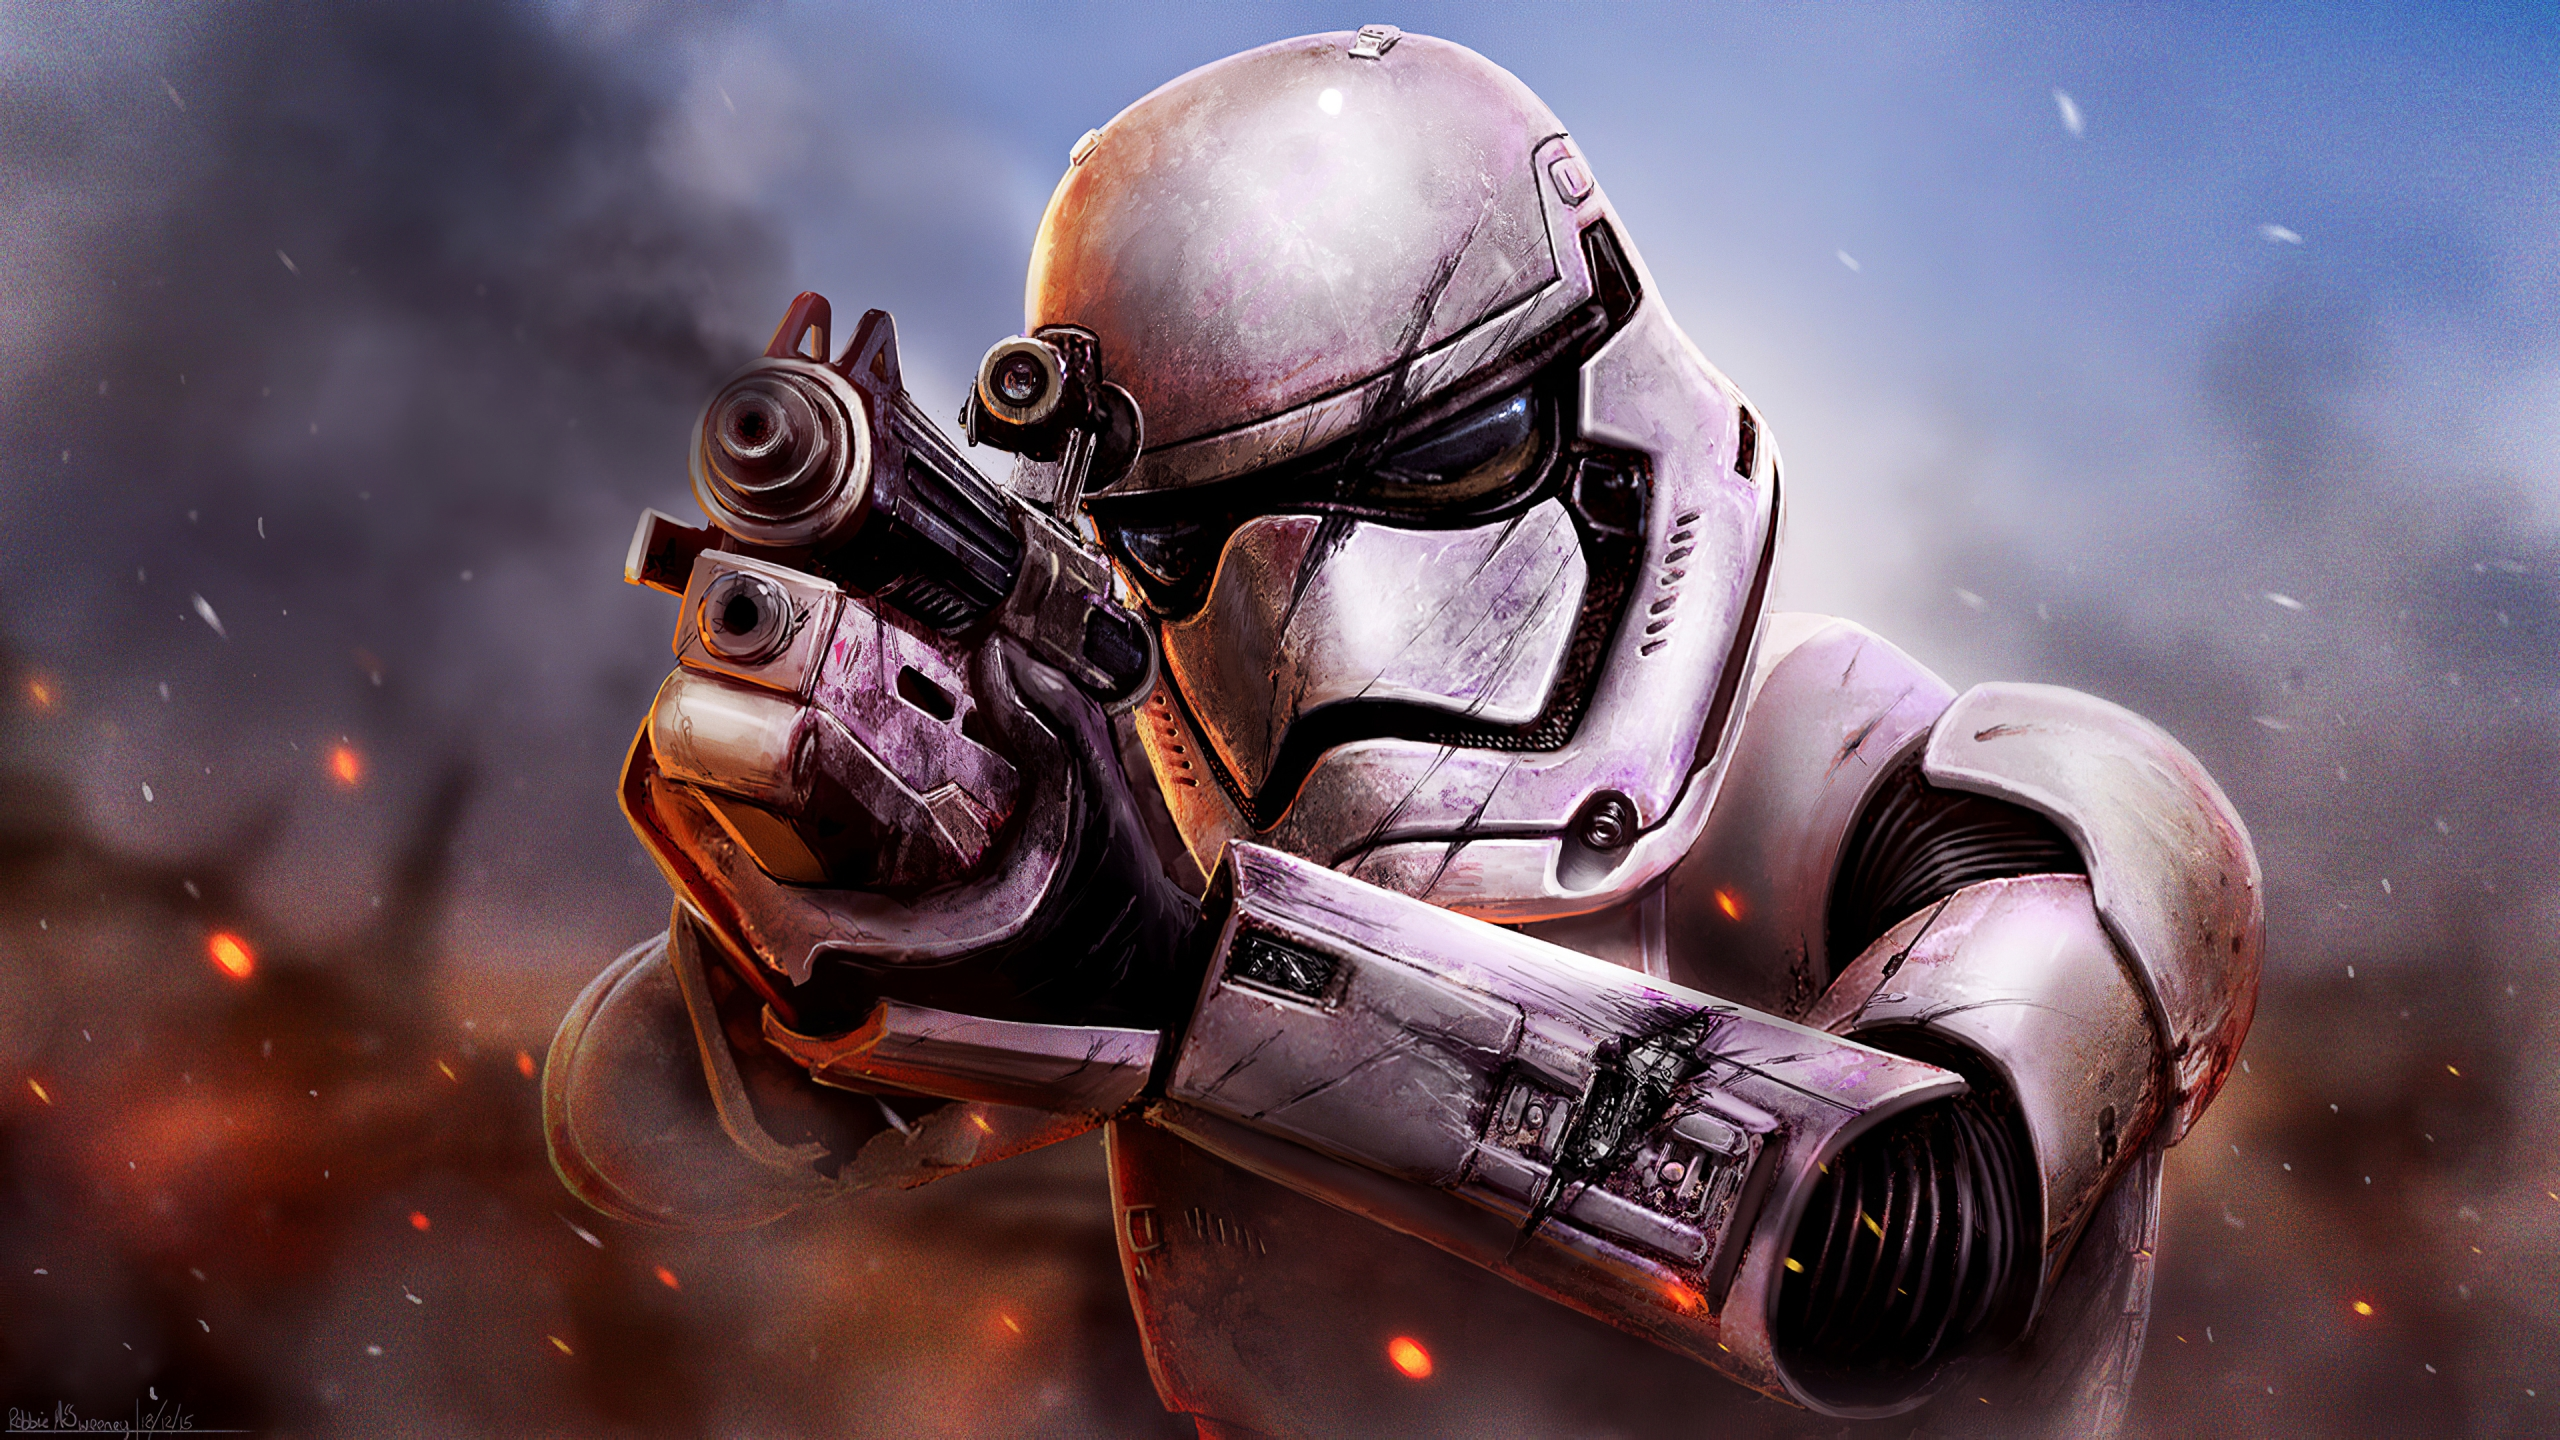 Stormtrooper From Star Wars Battlefront Wallpaper 4k Ultra Hd Id 5226